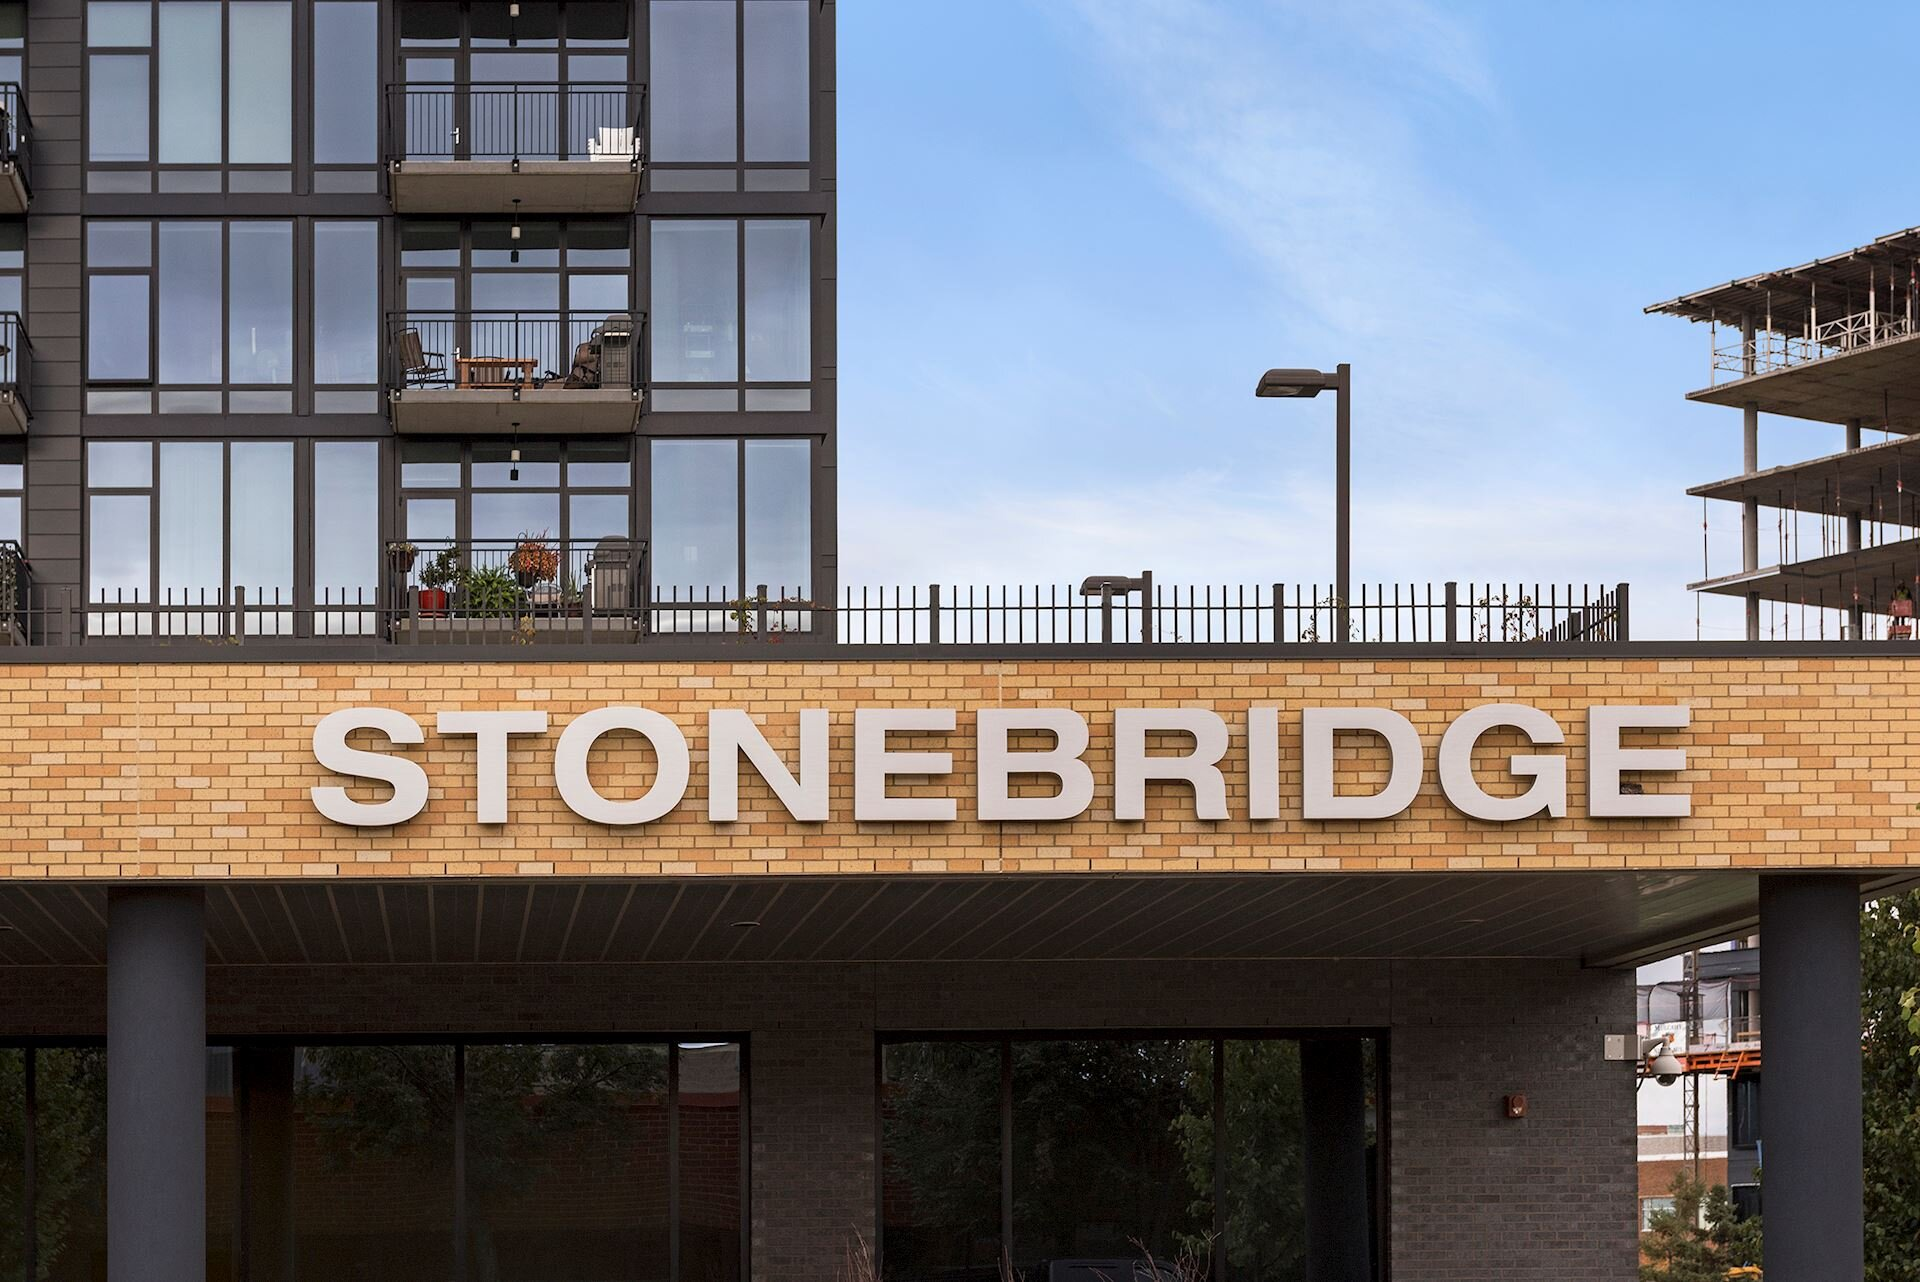 Stonebridge201_003.jpg